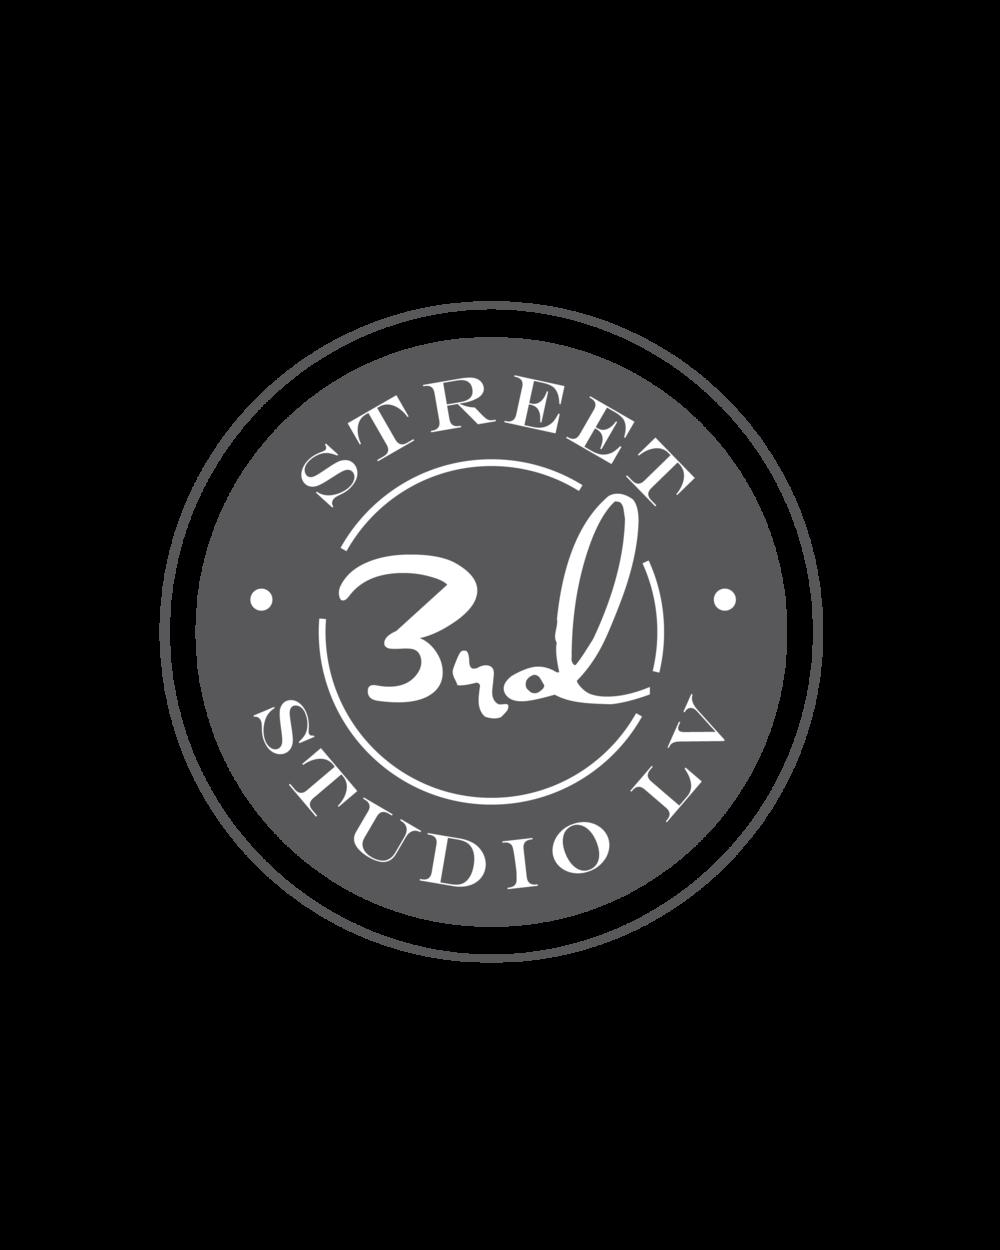 3rd street logo-01.png